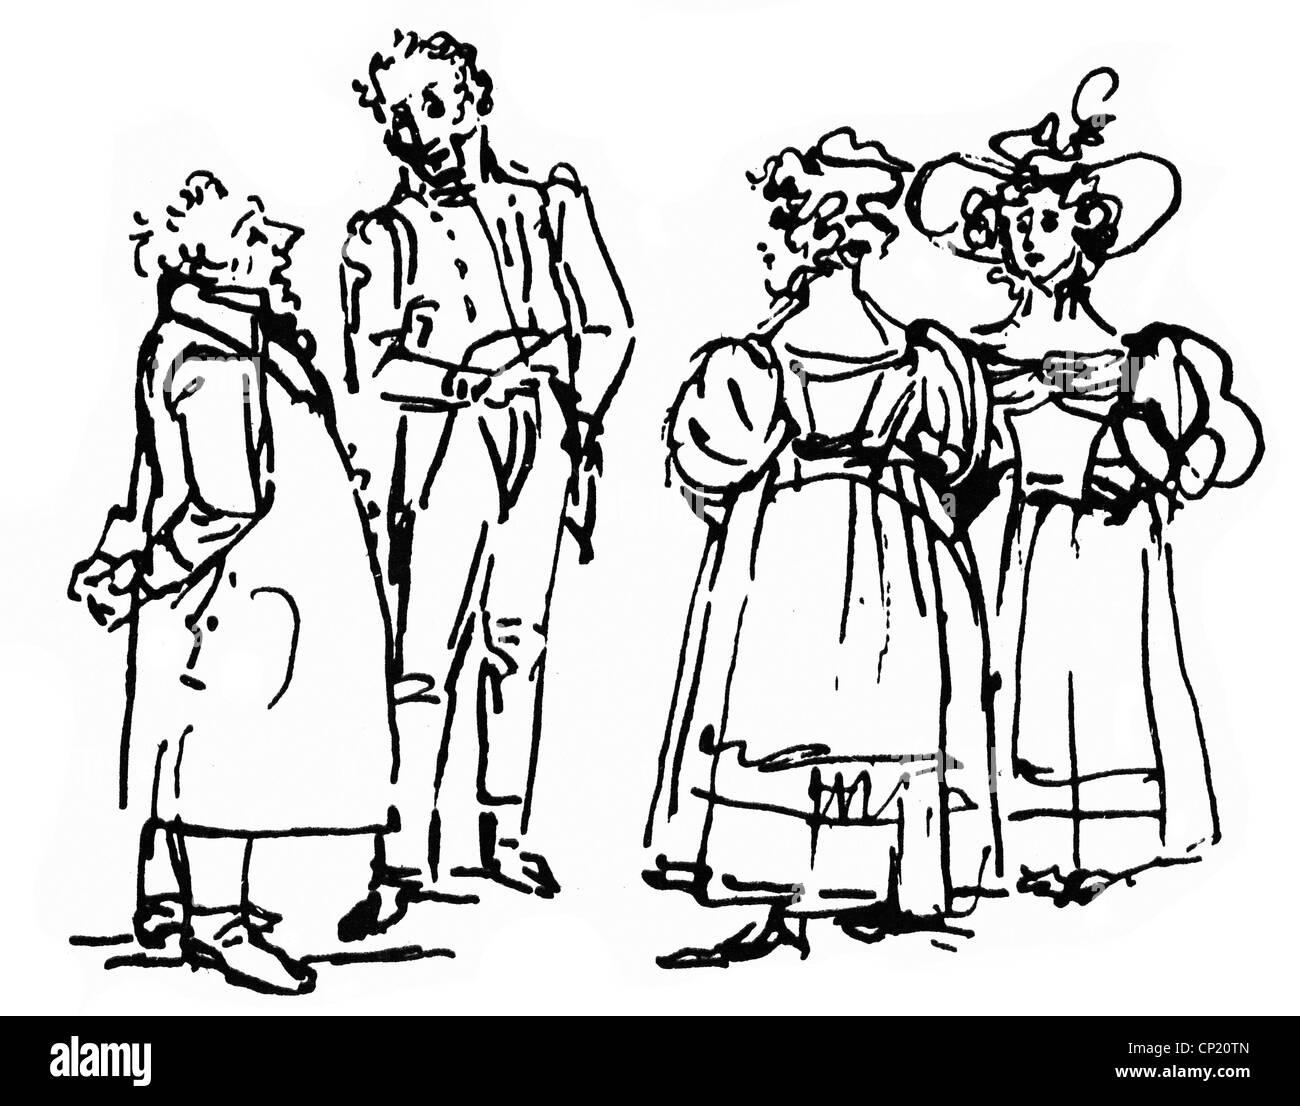 Schadow, Johann Gottfried, 20.5.1764 - 27.1.1850, German sculptor and graphic artist, works, art exhibition, scetch, drawing, circa 1835, Stock Photo